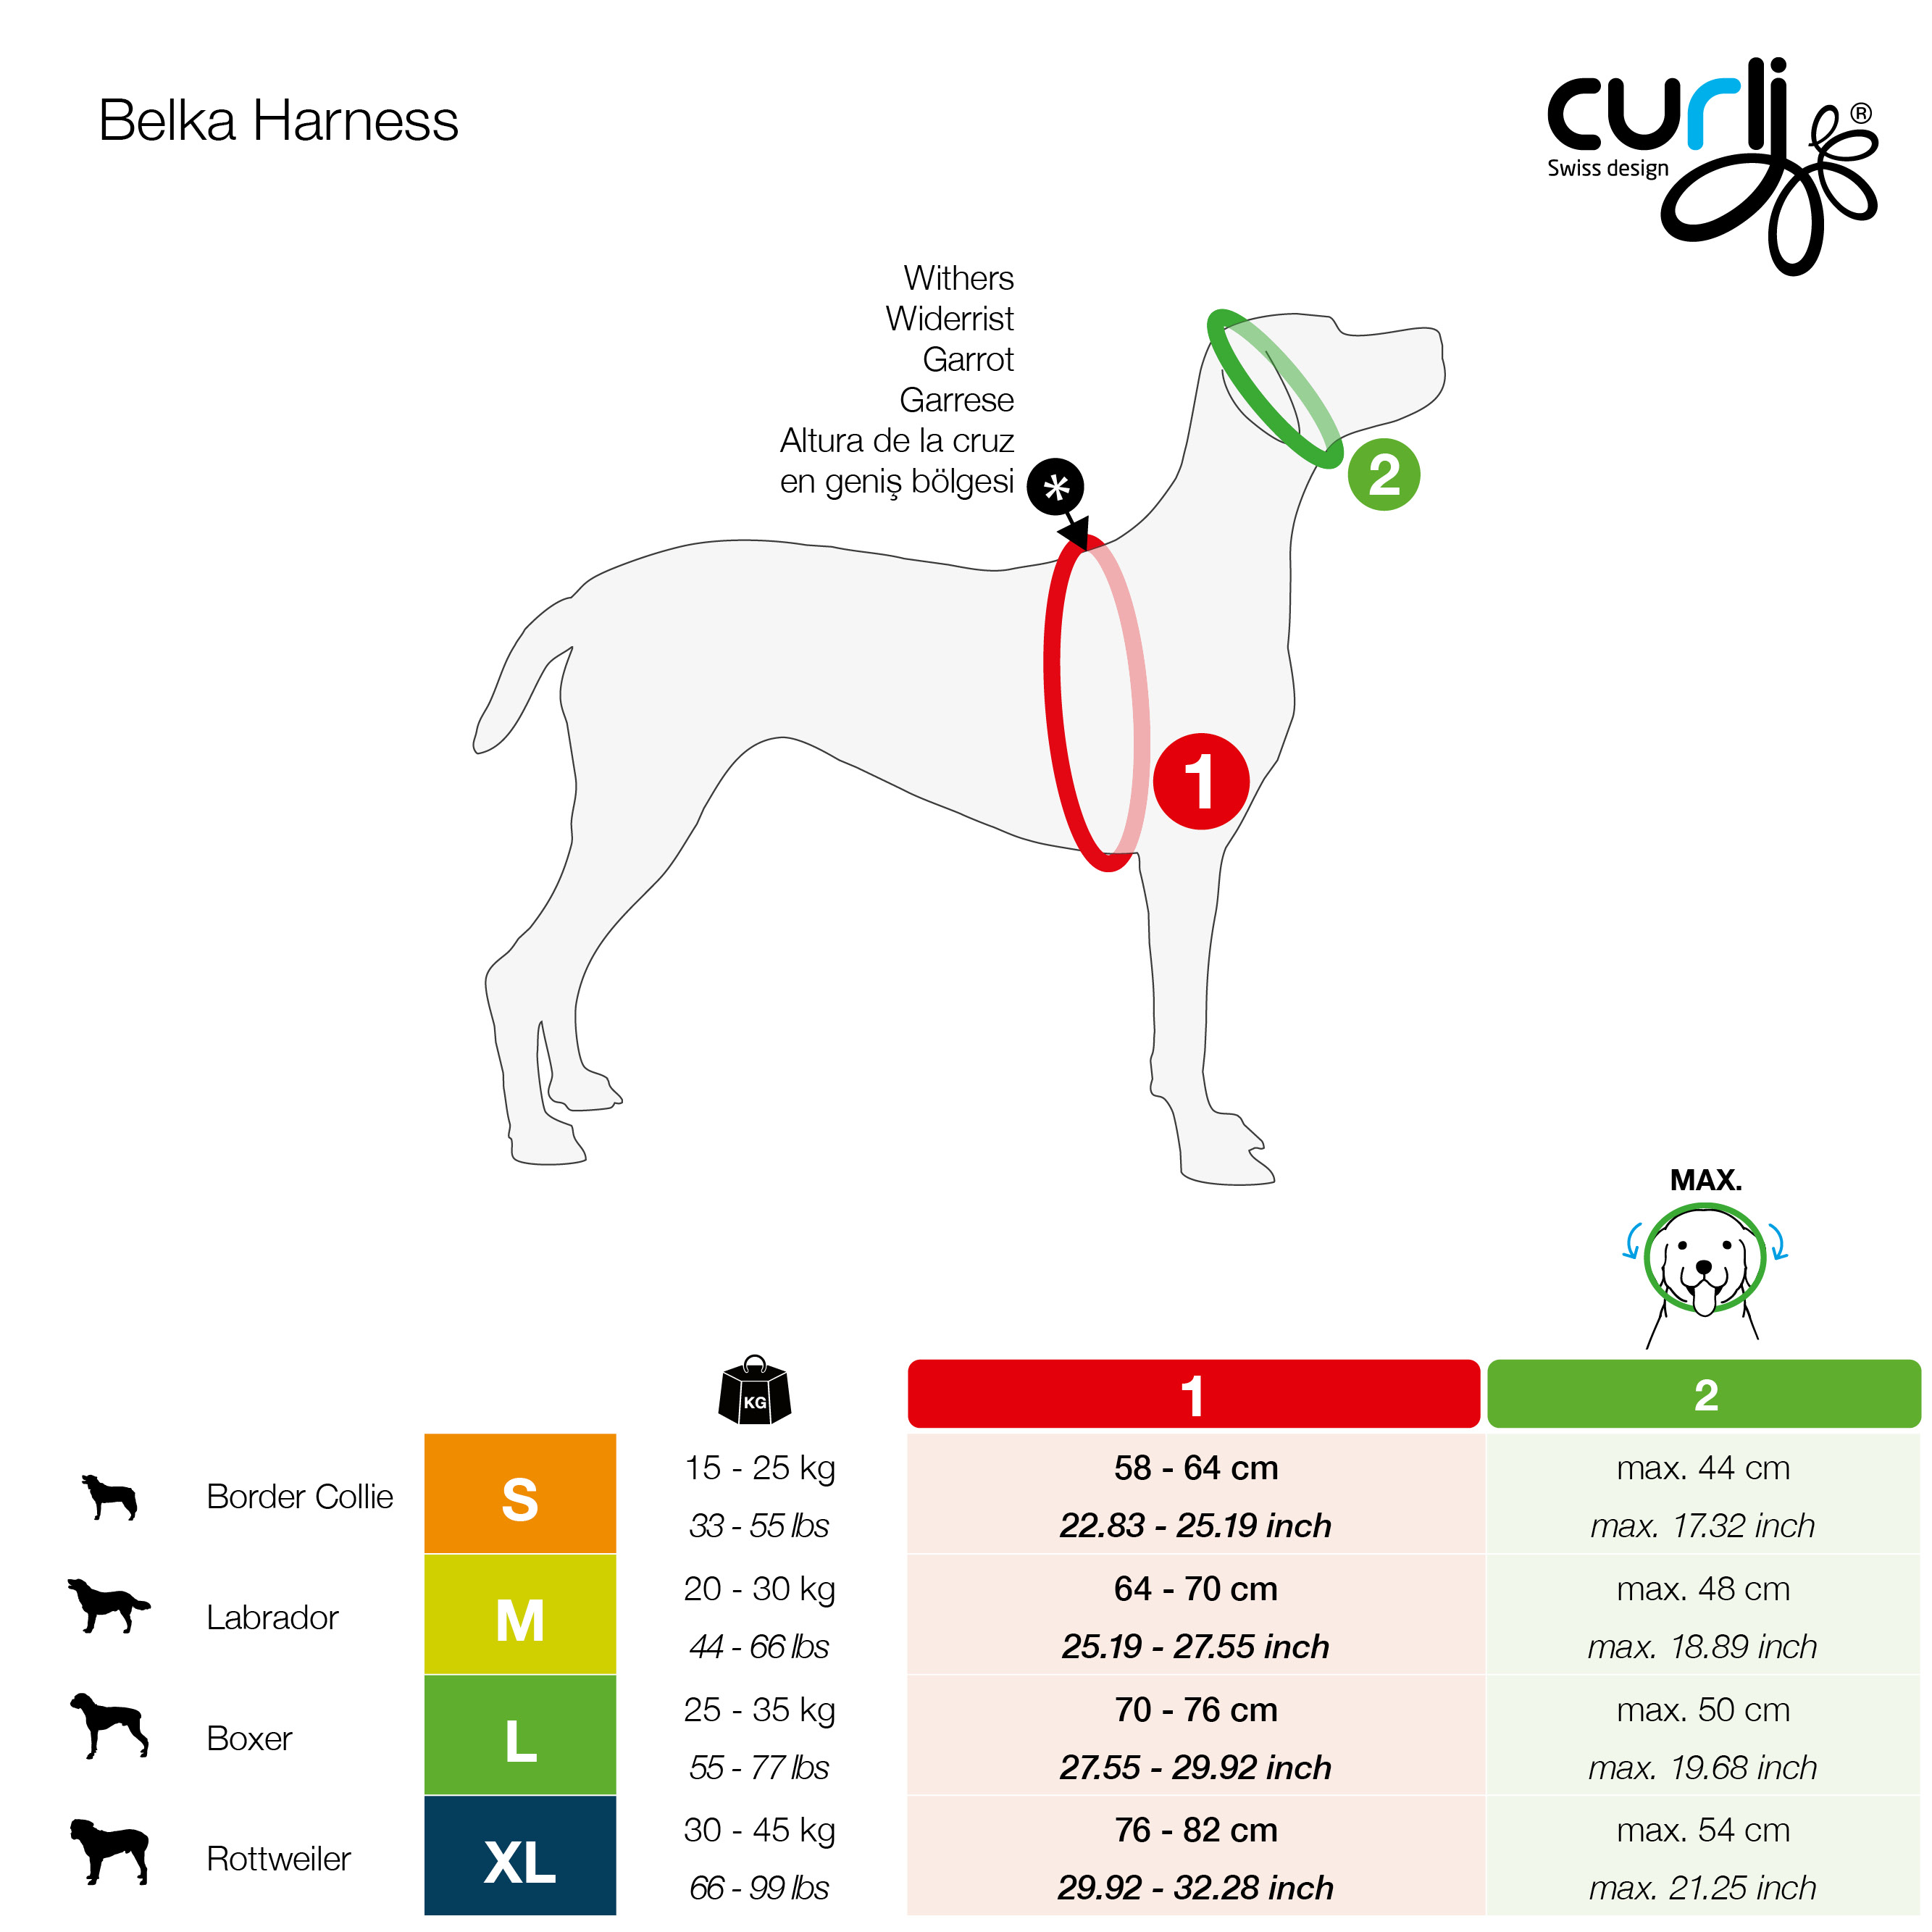 curli_Belka_Harness_Size_Chart